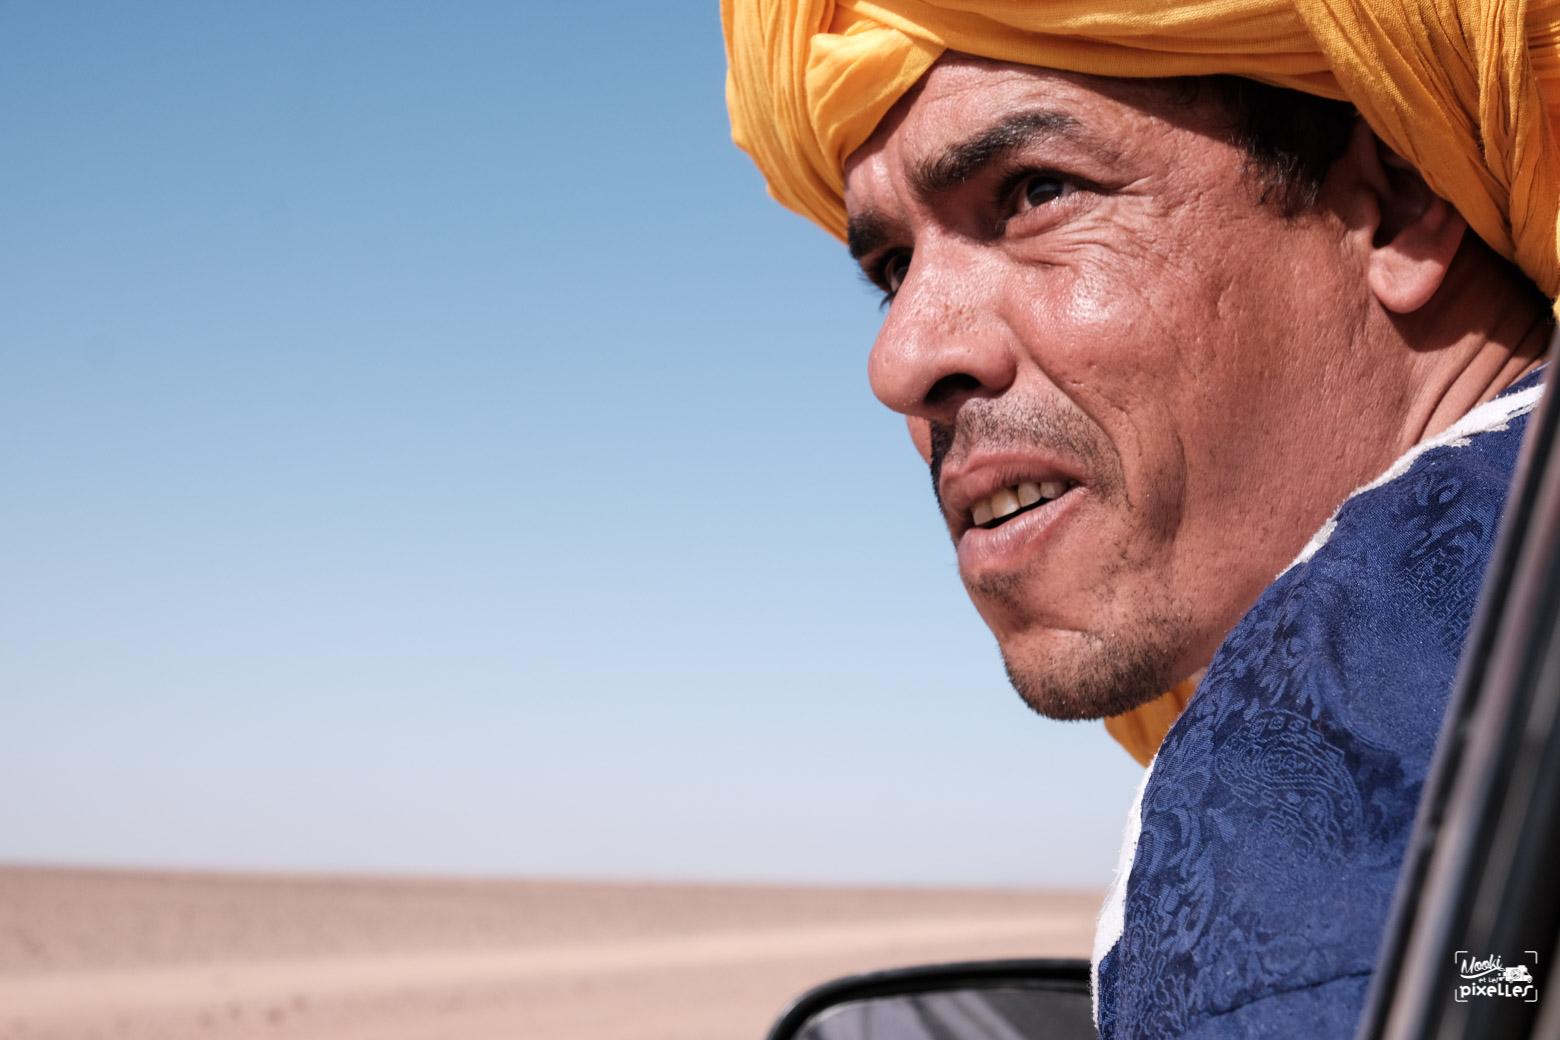 Notre guide Mbark à M'hamid au Maroc